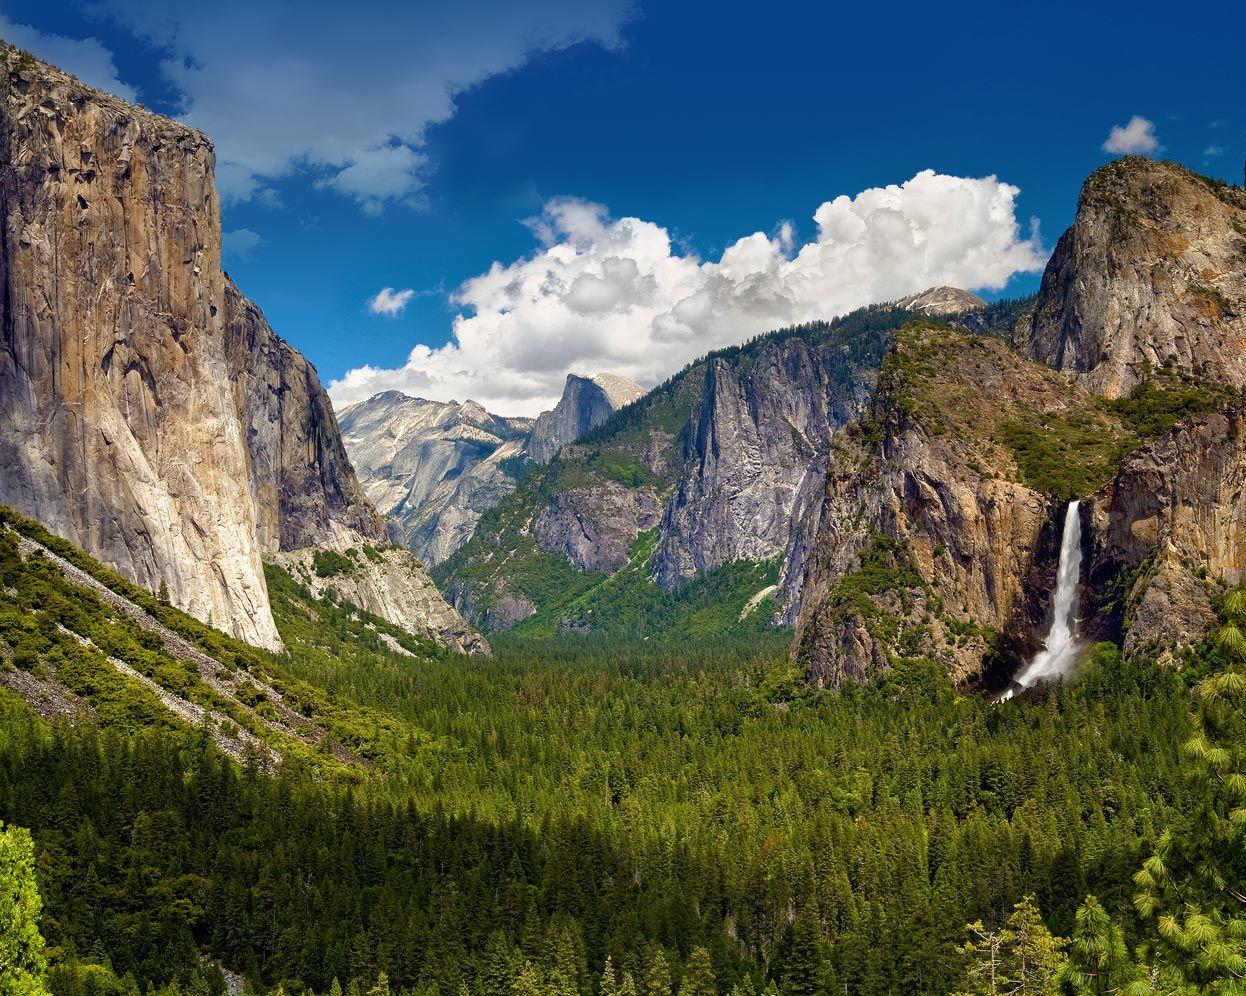 When you visit Yosemite Park